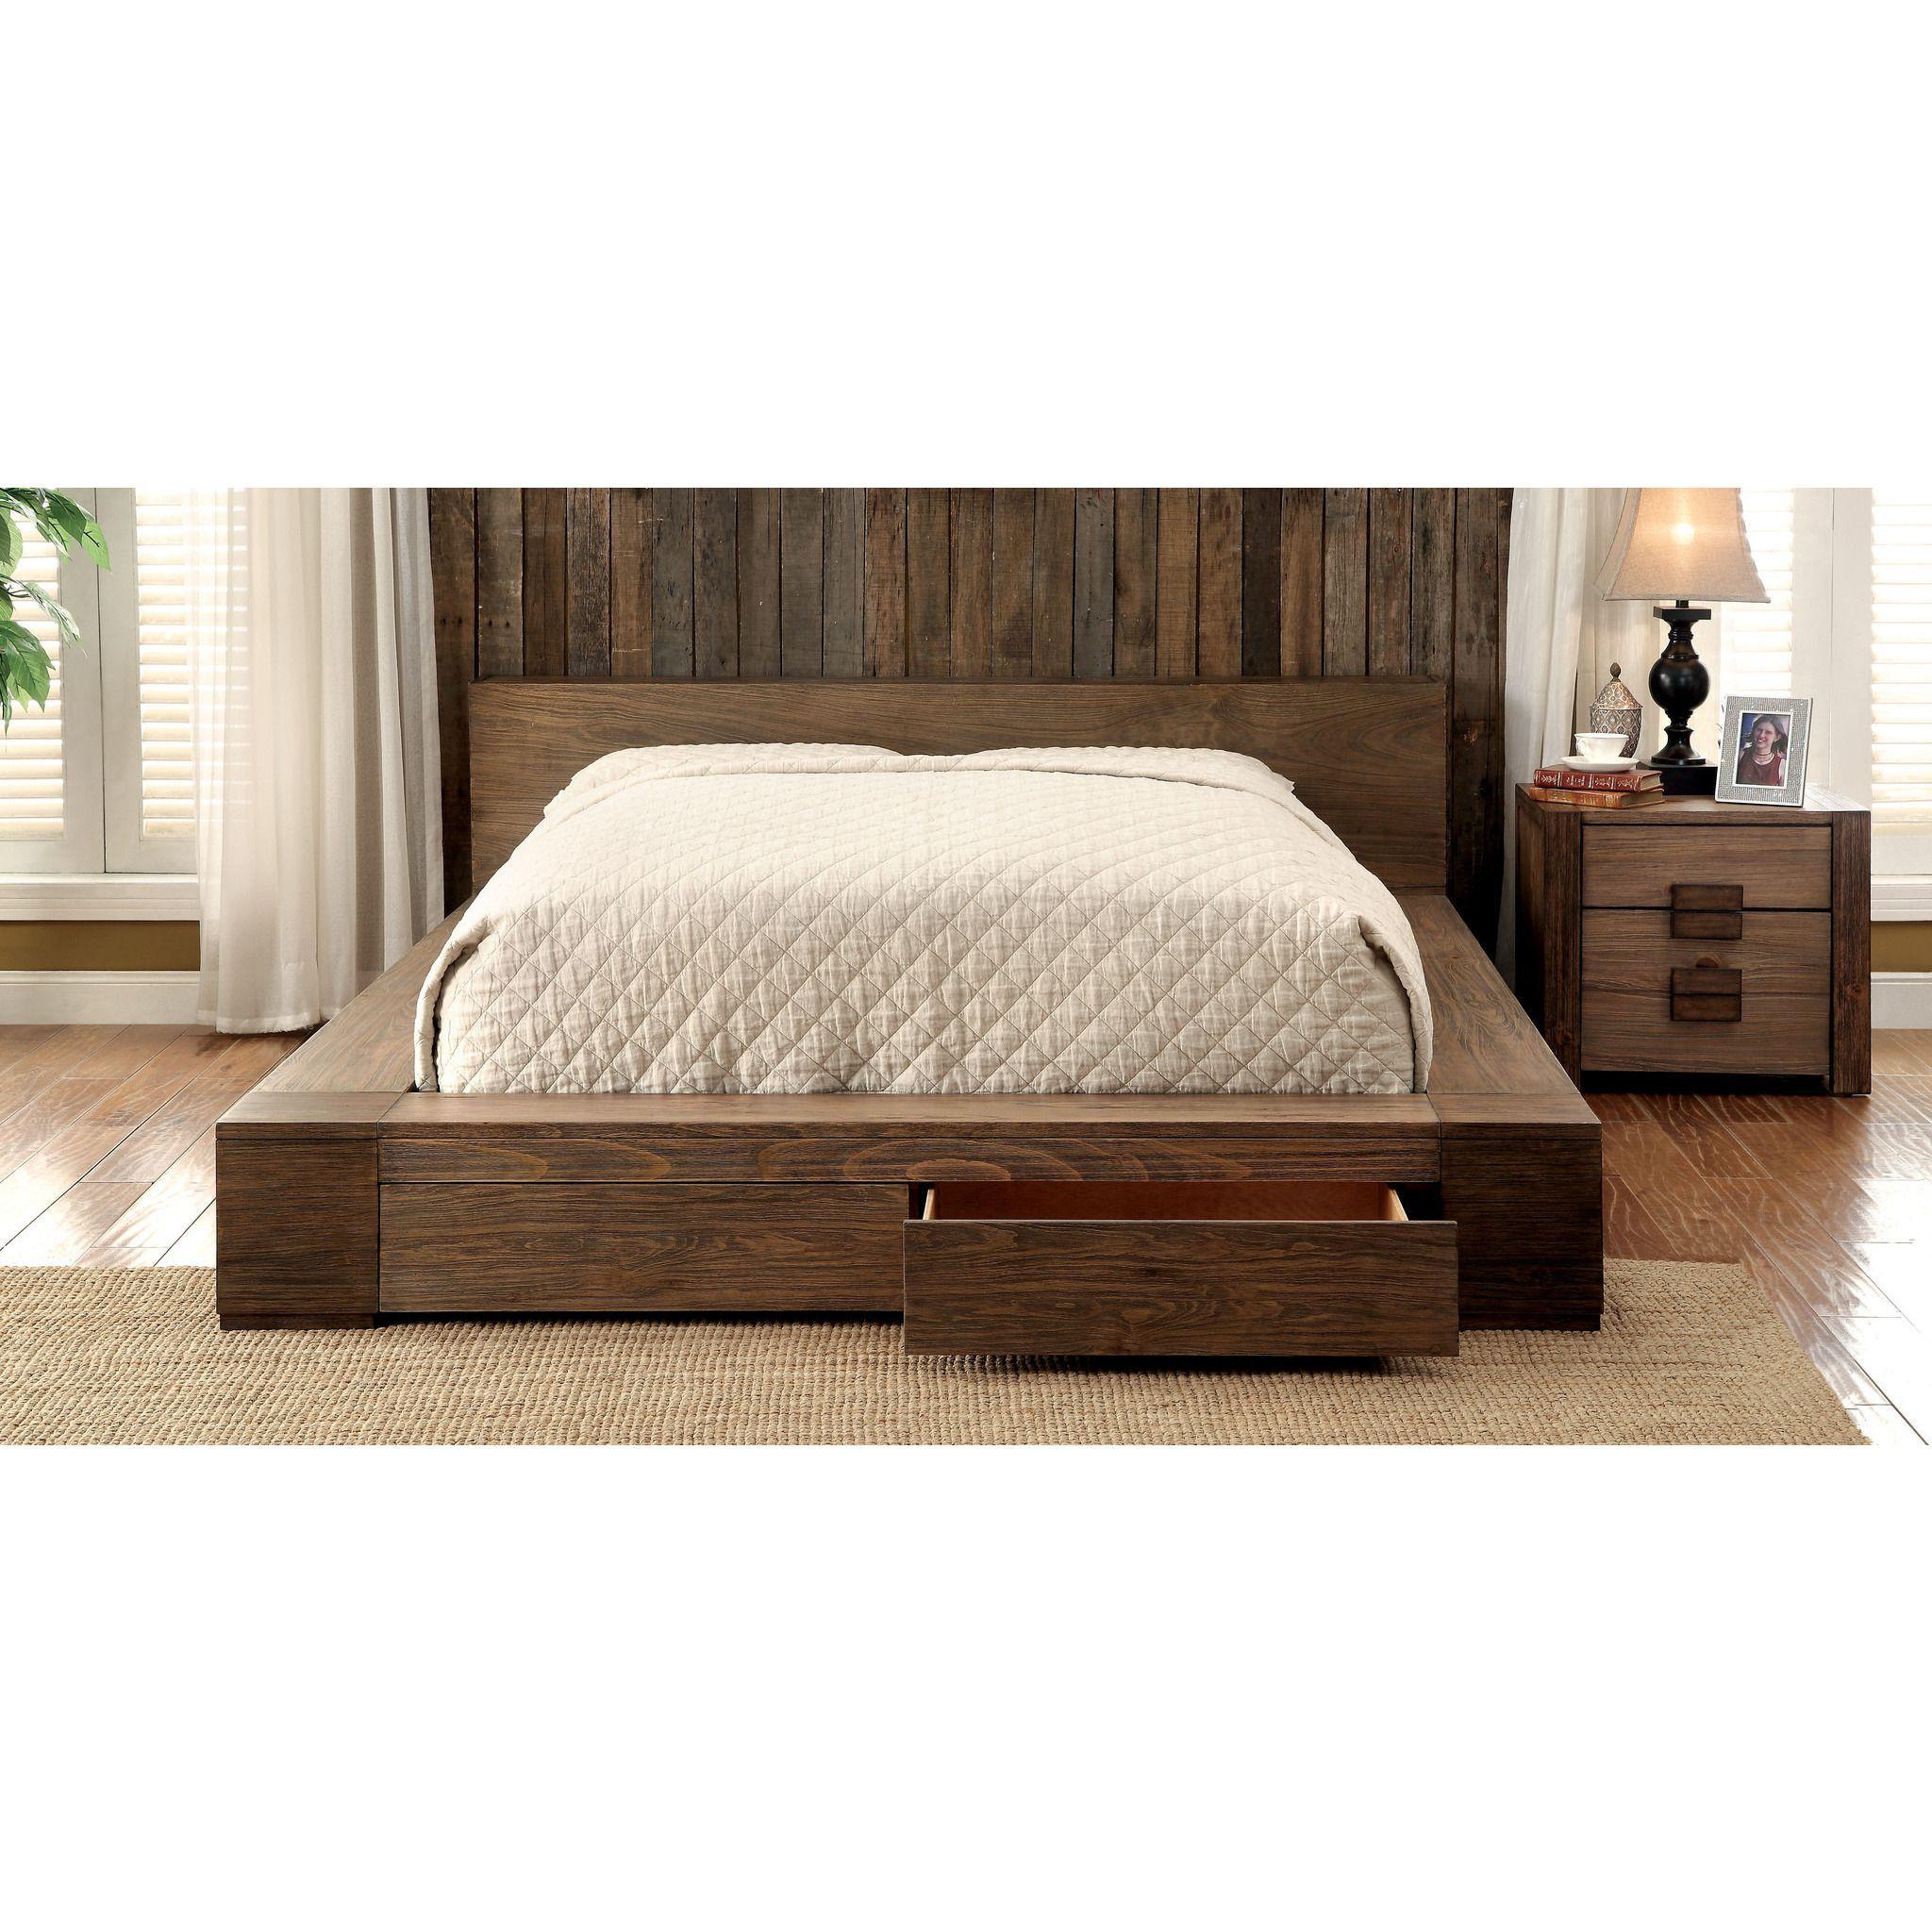 Moline Ii Transitional Low Profile California King Storage Platform Bed In Rustic Natural Tone Furniture Upholstered Platform Bed Solid Wood Storage